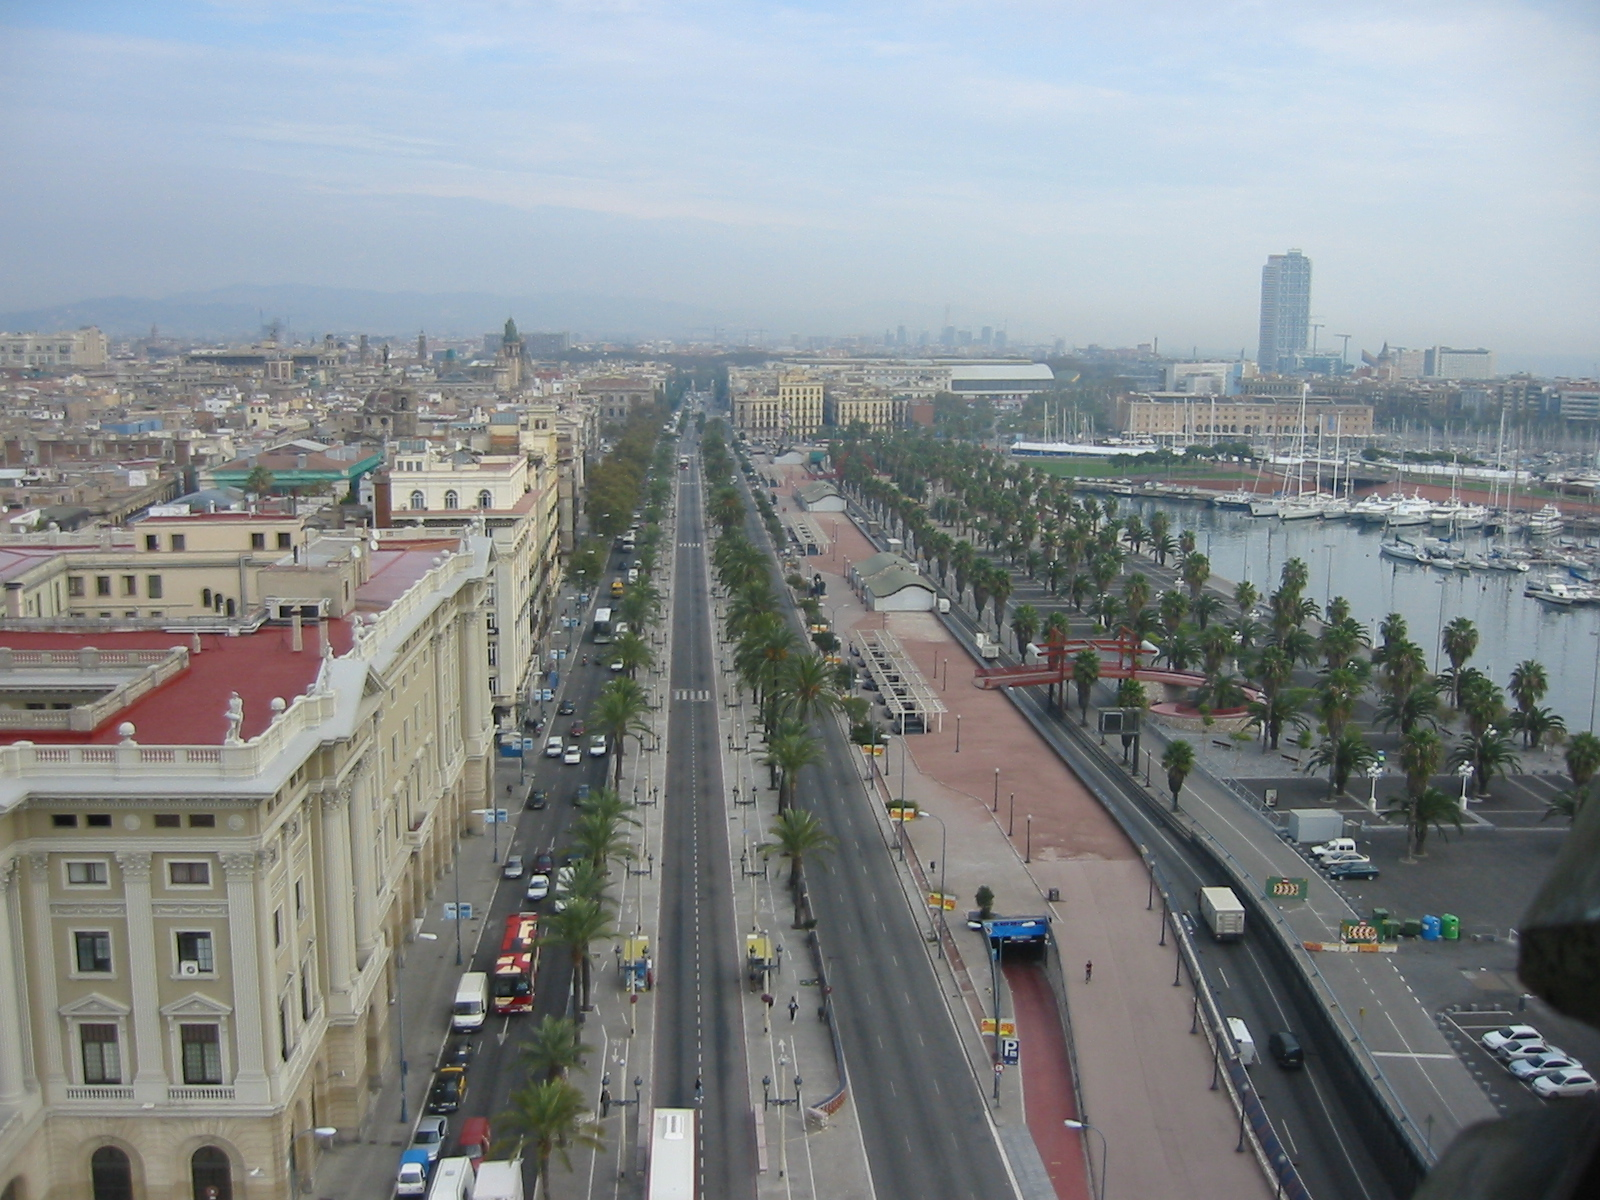 cityscapes nature landscapes city harbour palmtrees roads buildings smog barcelona